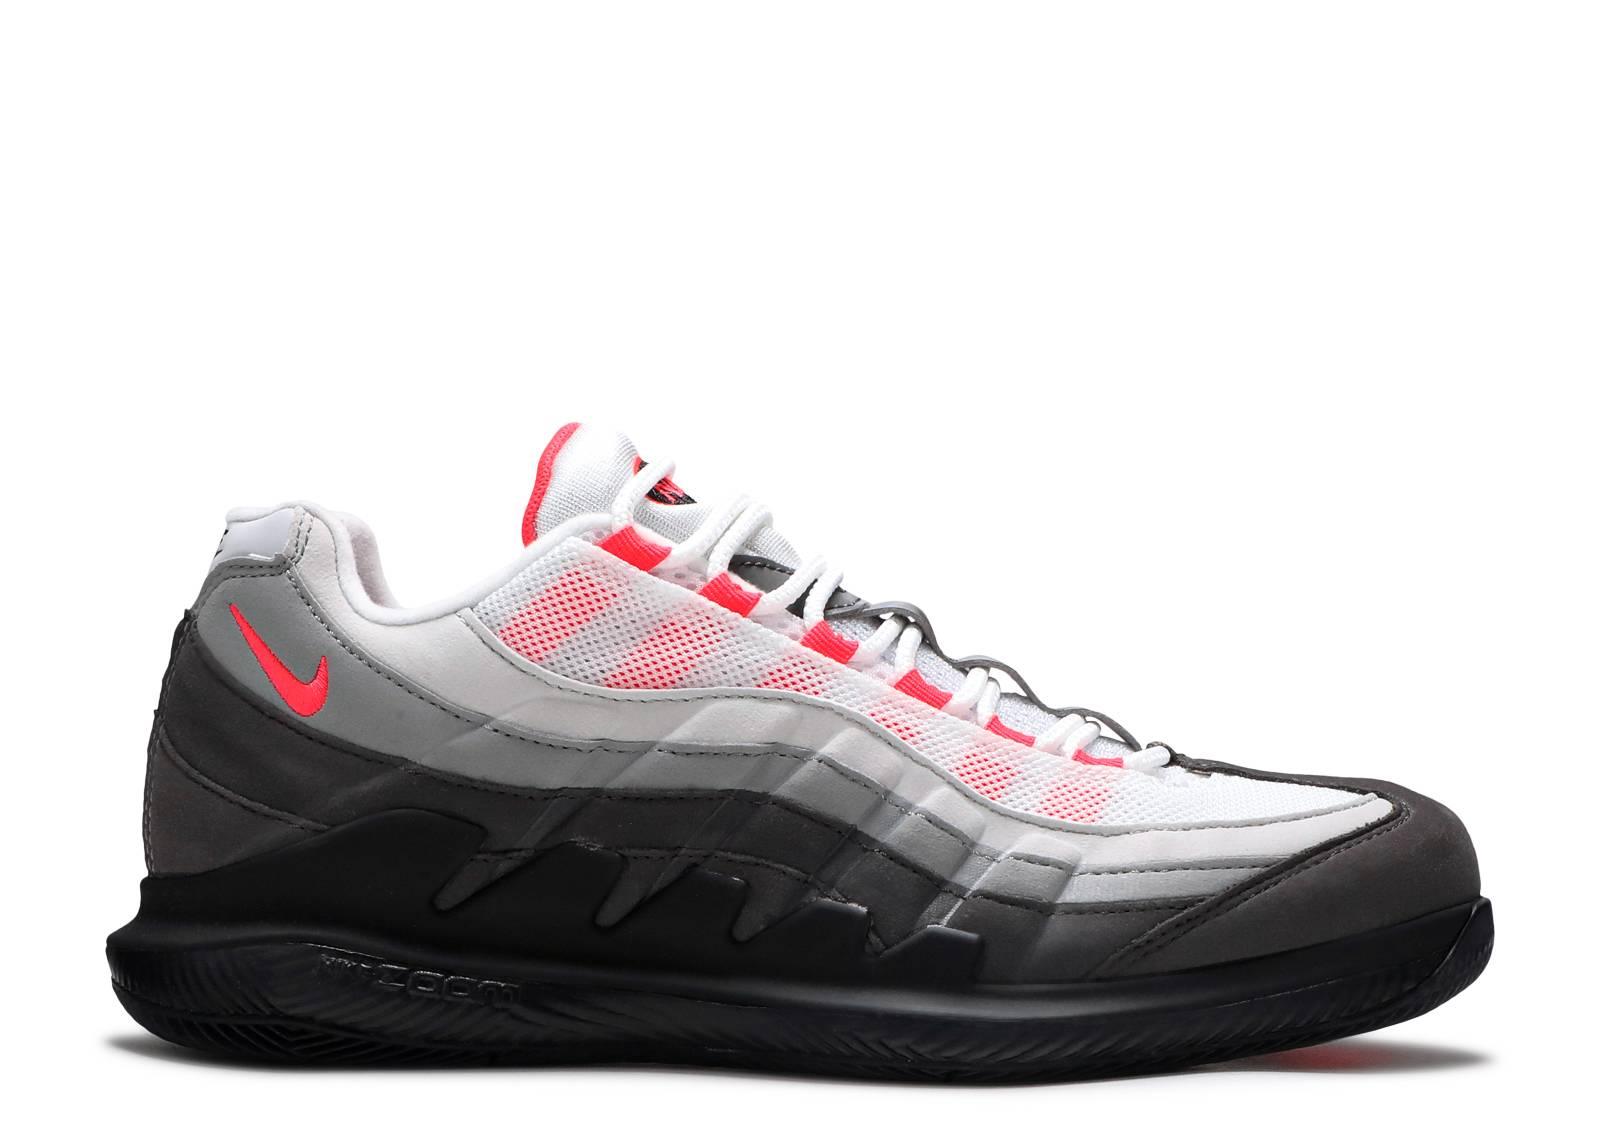 NikeCourt Zoom Vapor X Air Max 95 'Solar Red'